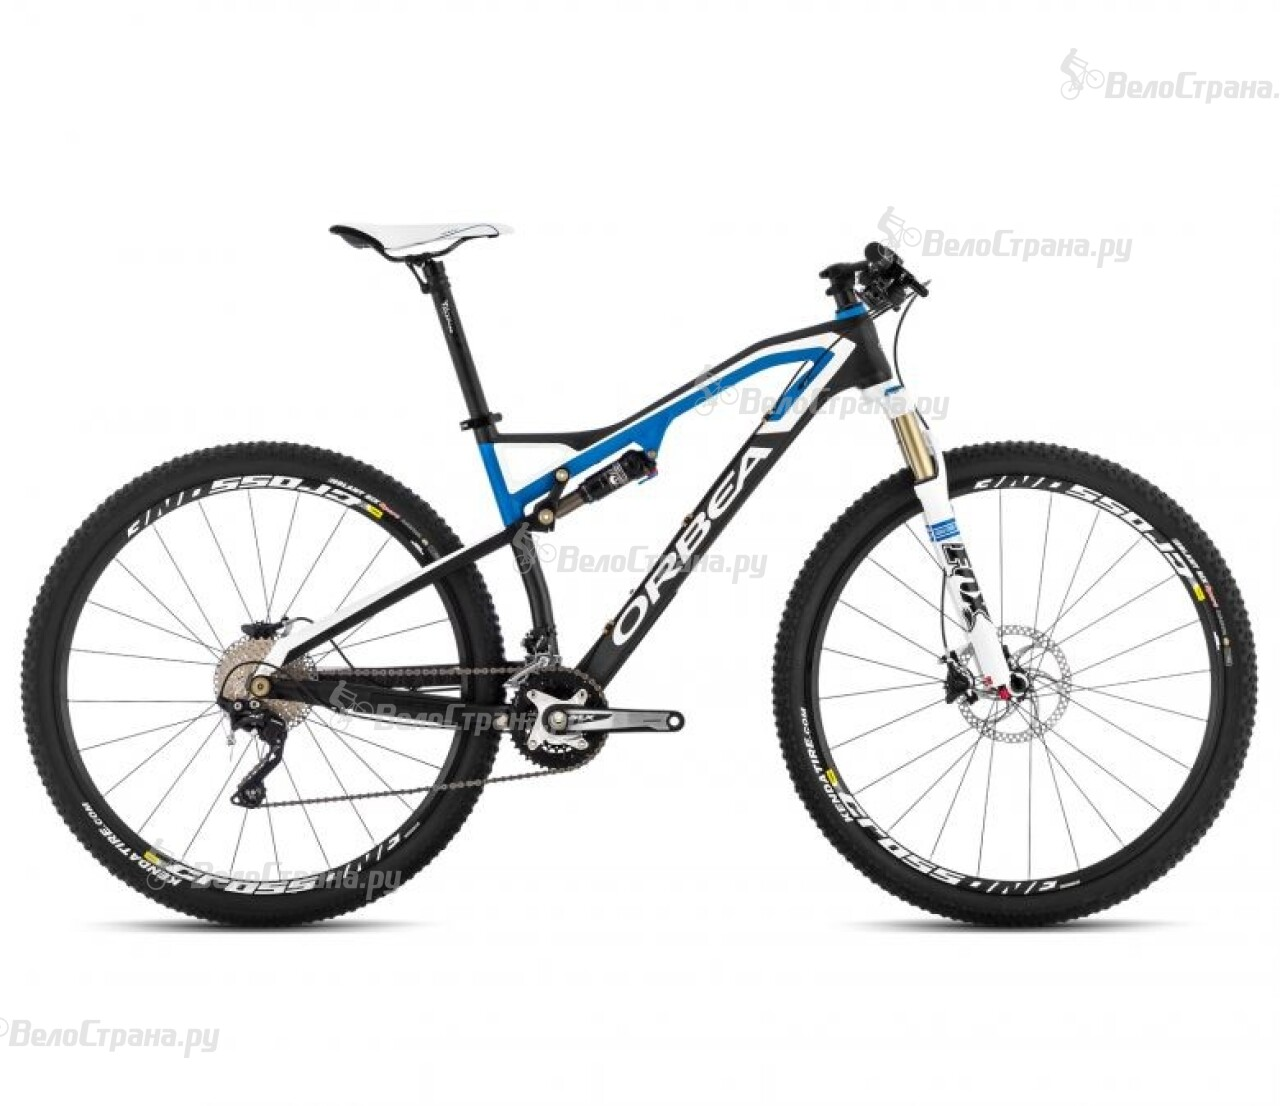 Велосипед Orbea Occam 29 M50 (2014) аккумулятор для ноутбука oem 5200mah asus n61 n61j n61d n61v n61vg n61ja n61jv n53 a32 m50 m50s n53s n53sv a32 m50 a32 n61 a32 x 64 33 m50 n53s n53 a32 m50 m50s n53s n53sv a32 m50